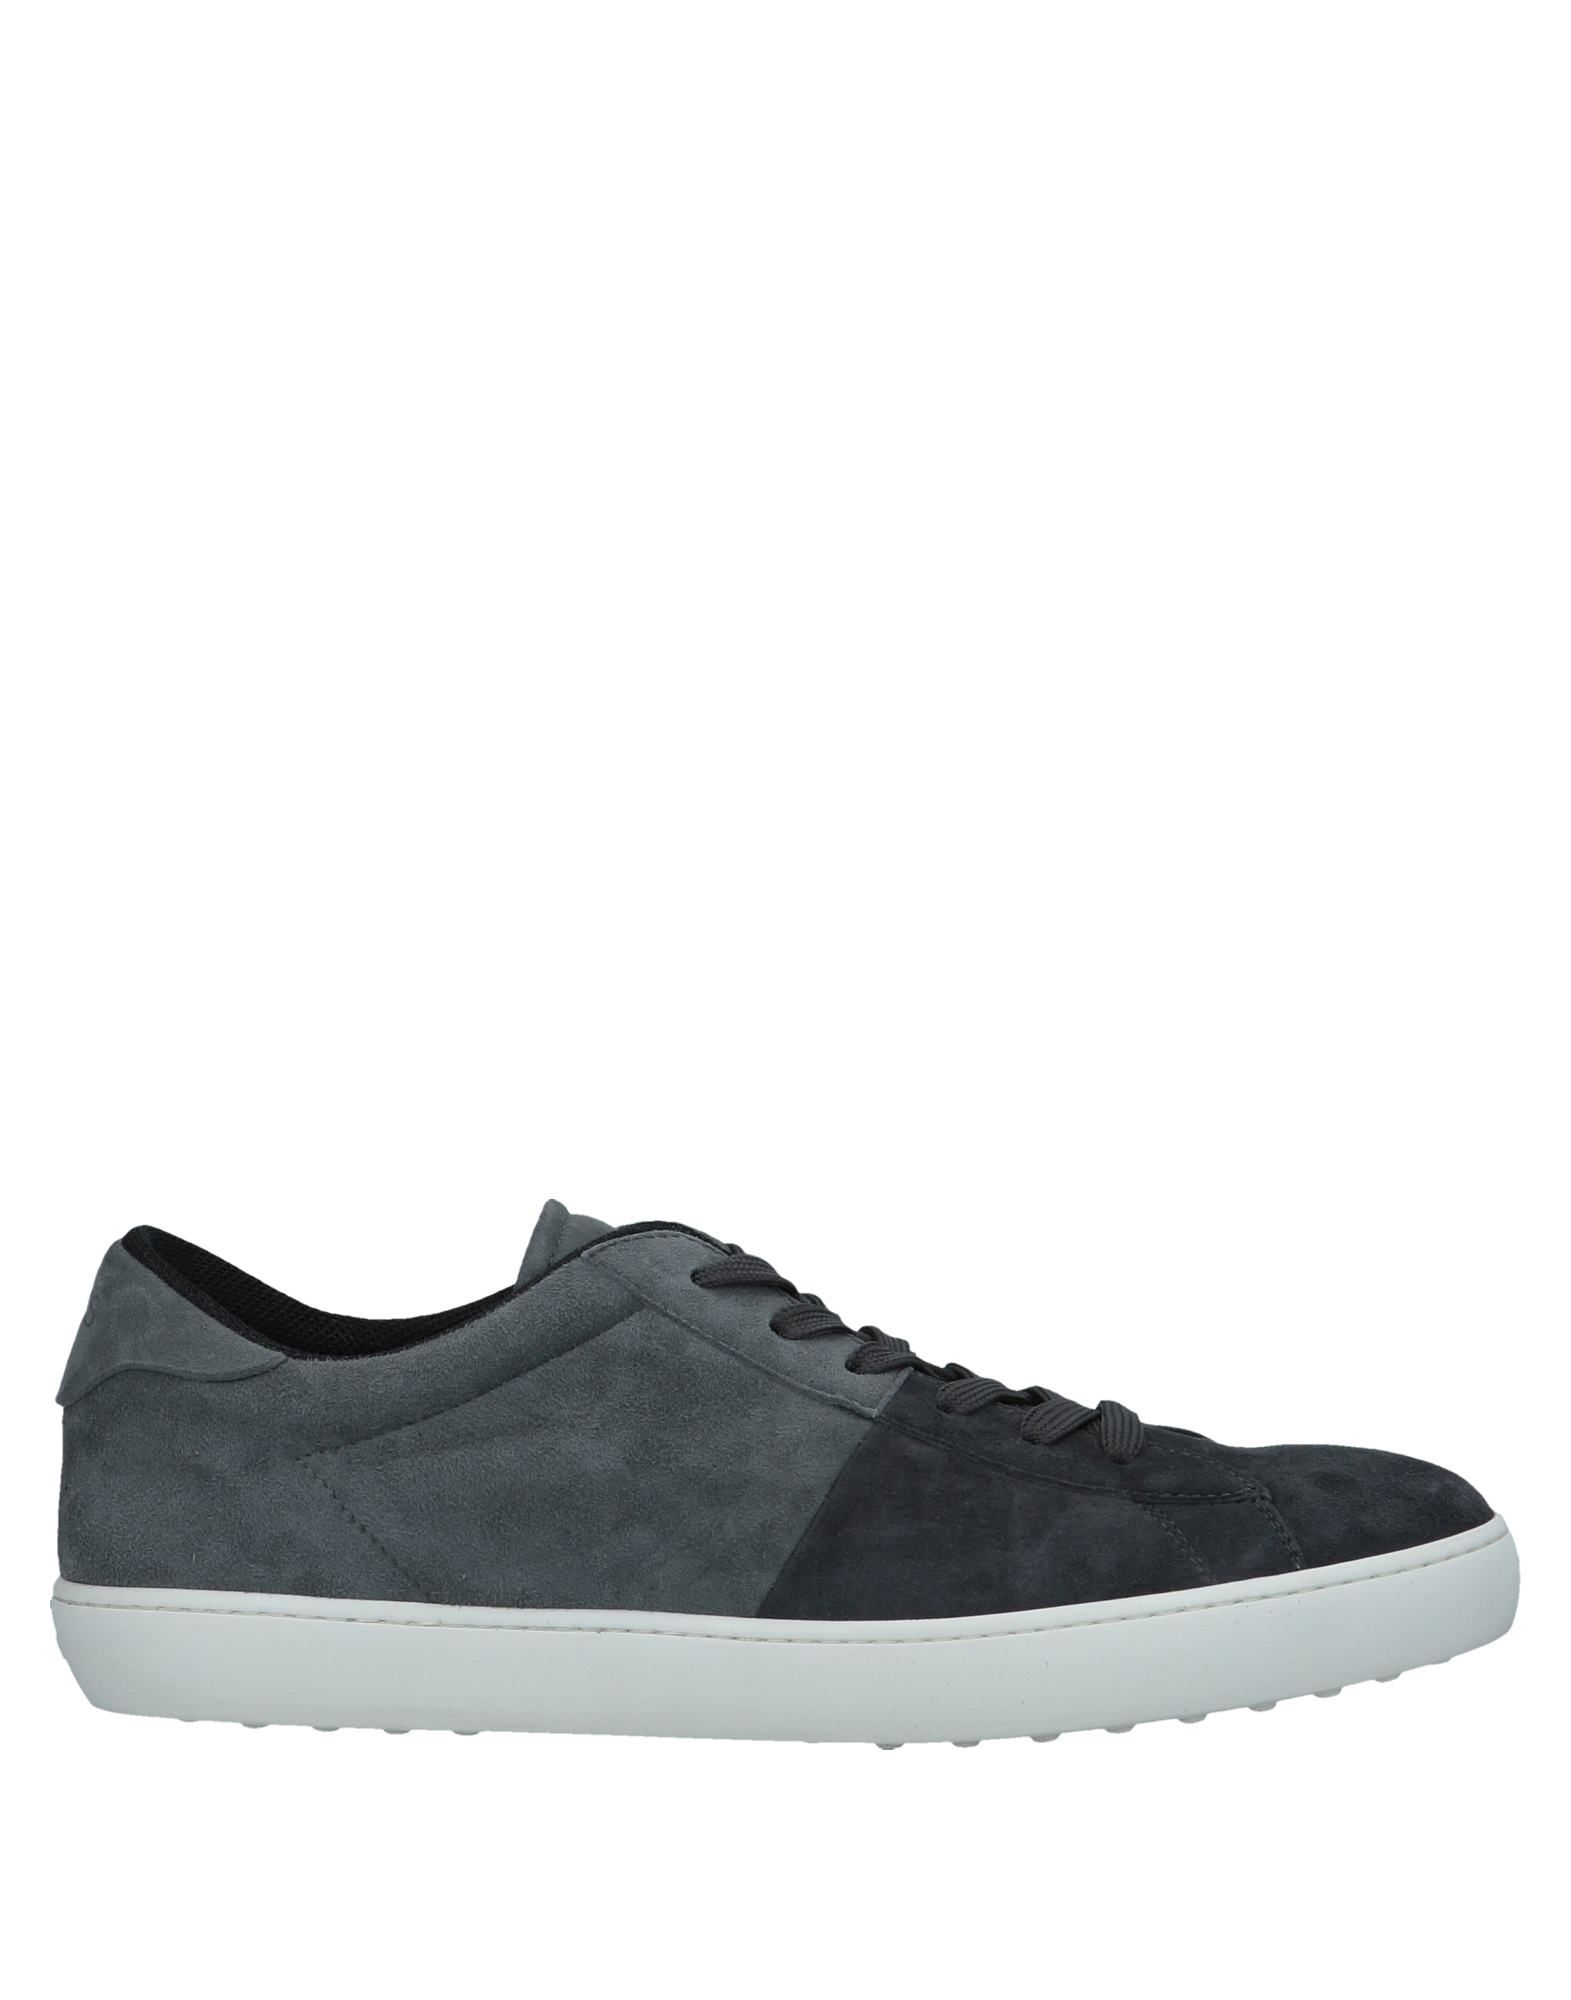 Tod's Sneakers Herren  11540705MV Gute Qualität beliebte Schuhe